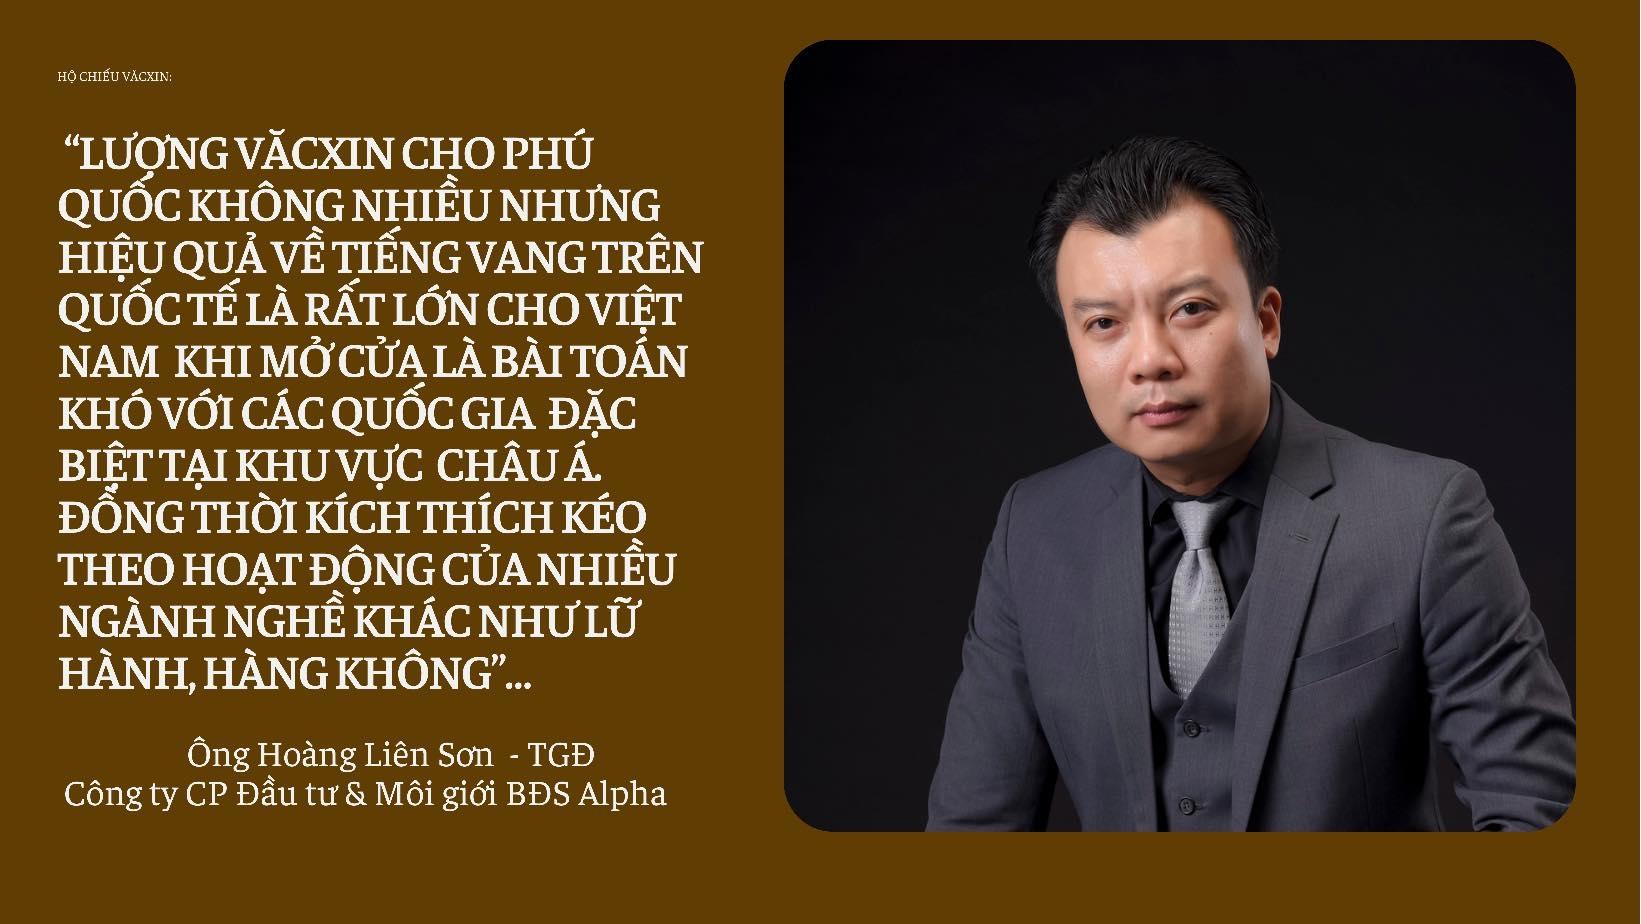 chuan bi san sang thi diem don khach quoc te co ho chieu vaccine den phu quoc